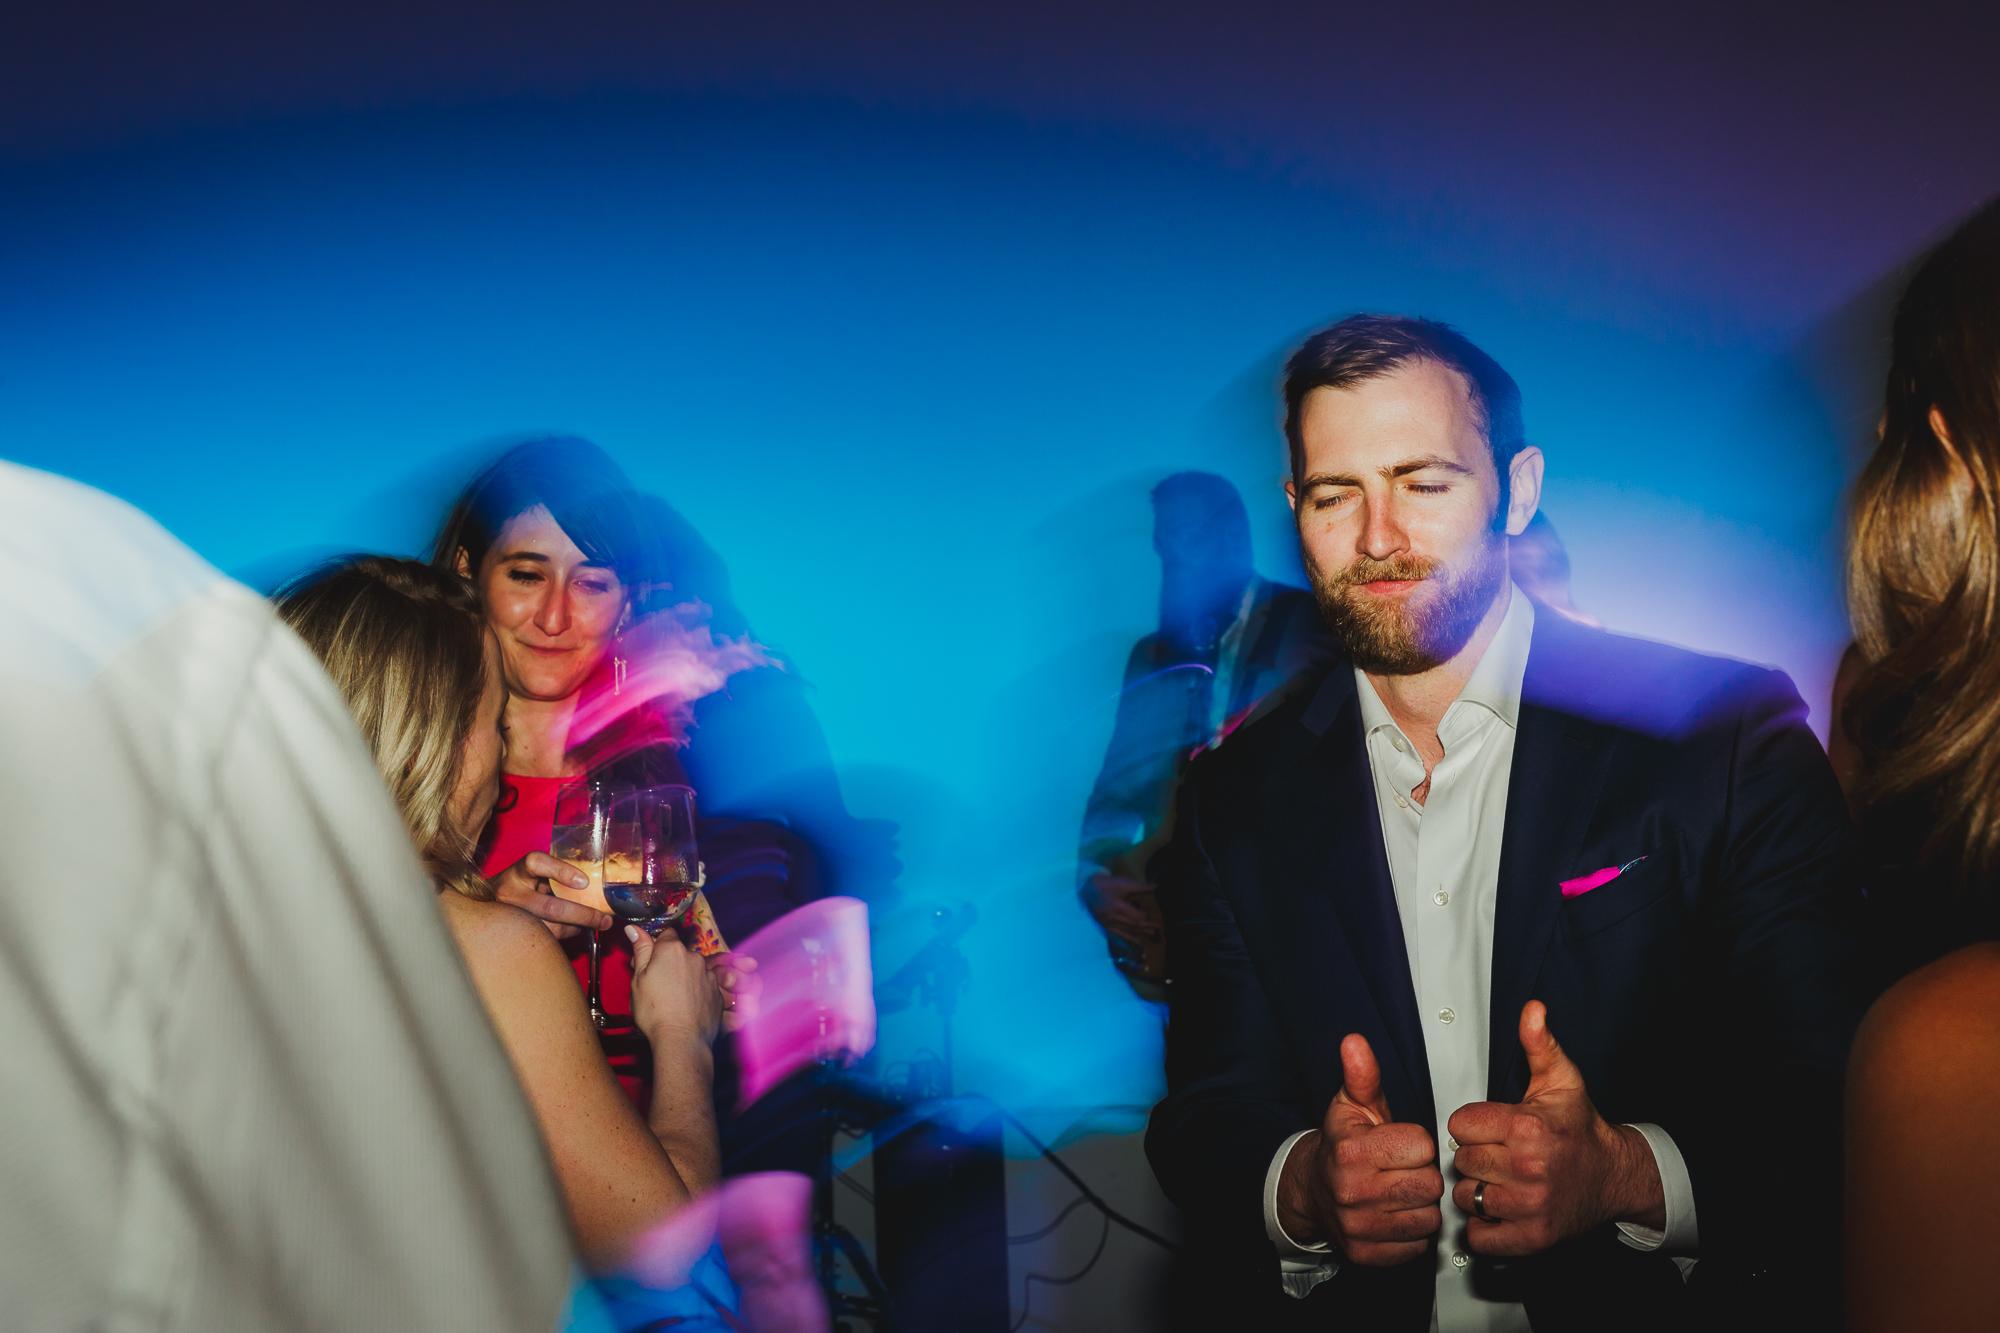 canvas event space wedding photos by Krista Welch-0137.jpg